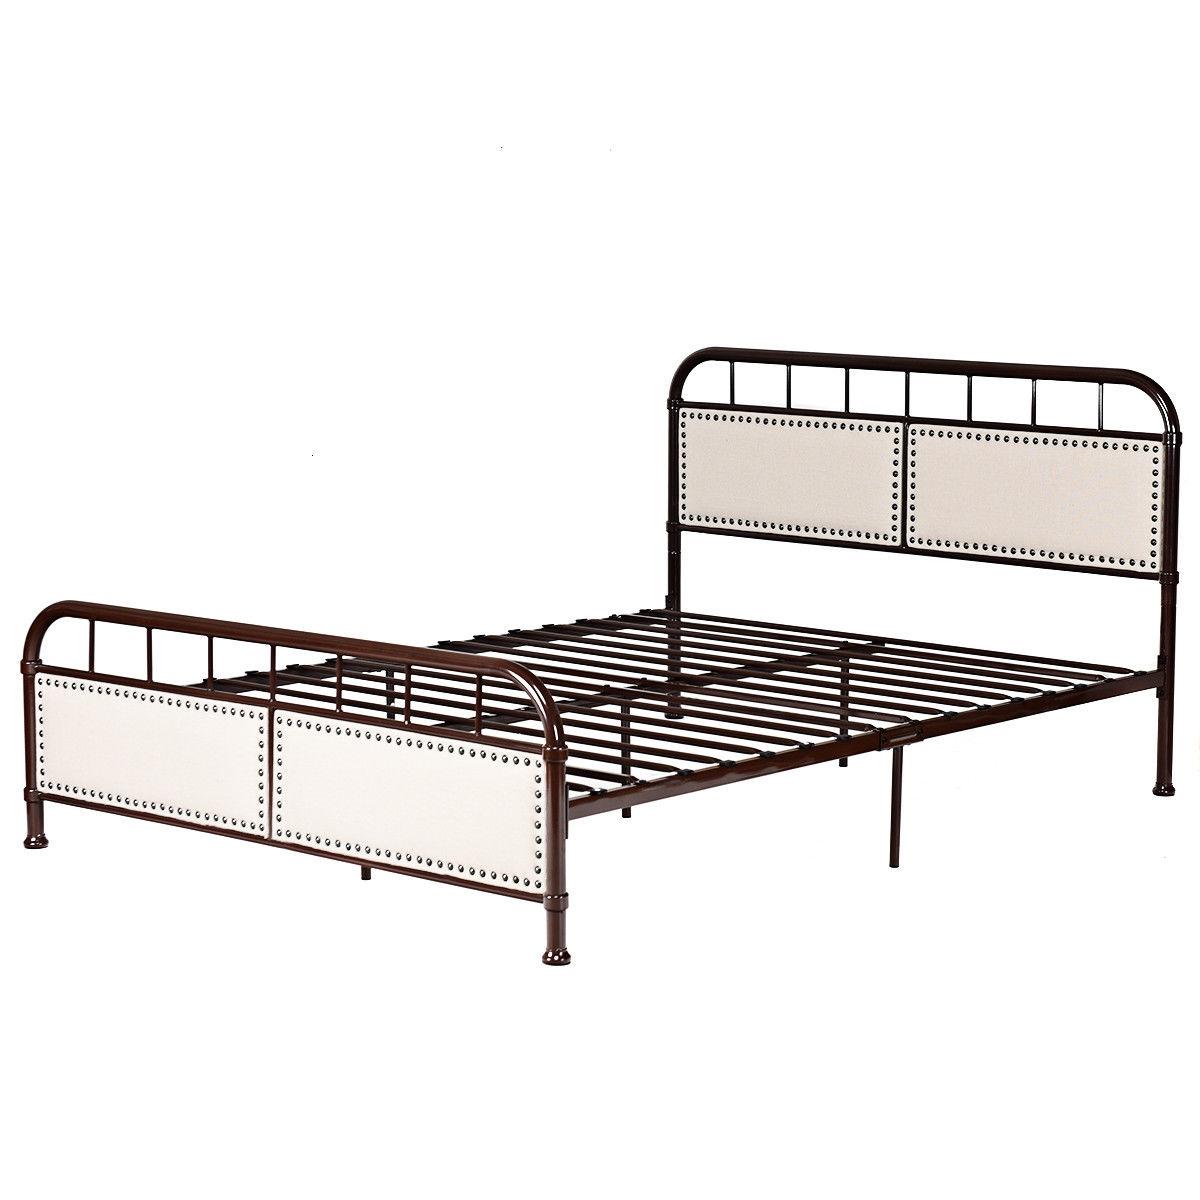 Queen size Metal Bed Frame Platform Bed Upholstered Panel Headboard Footboard